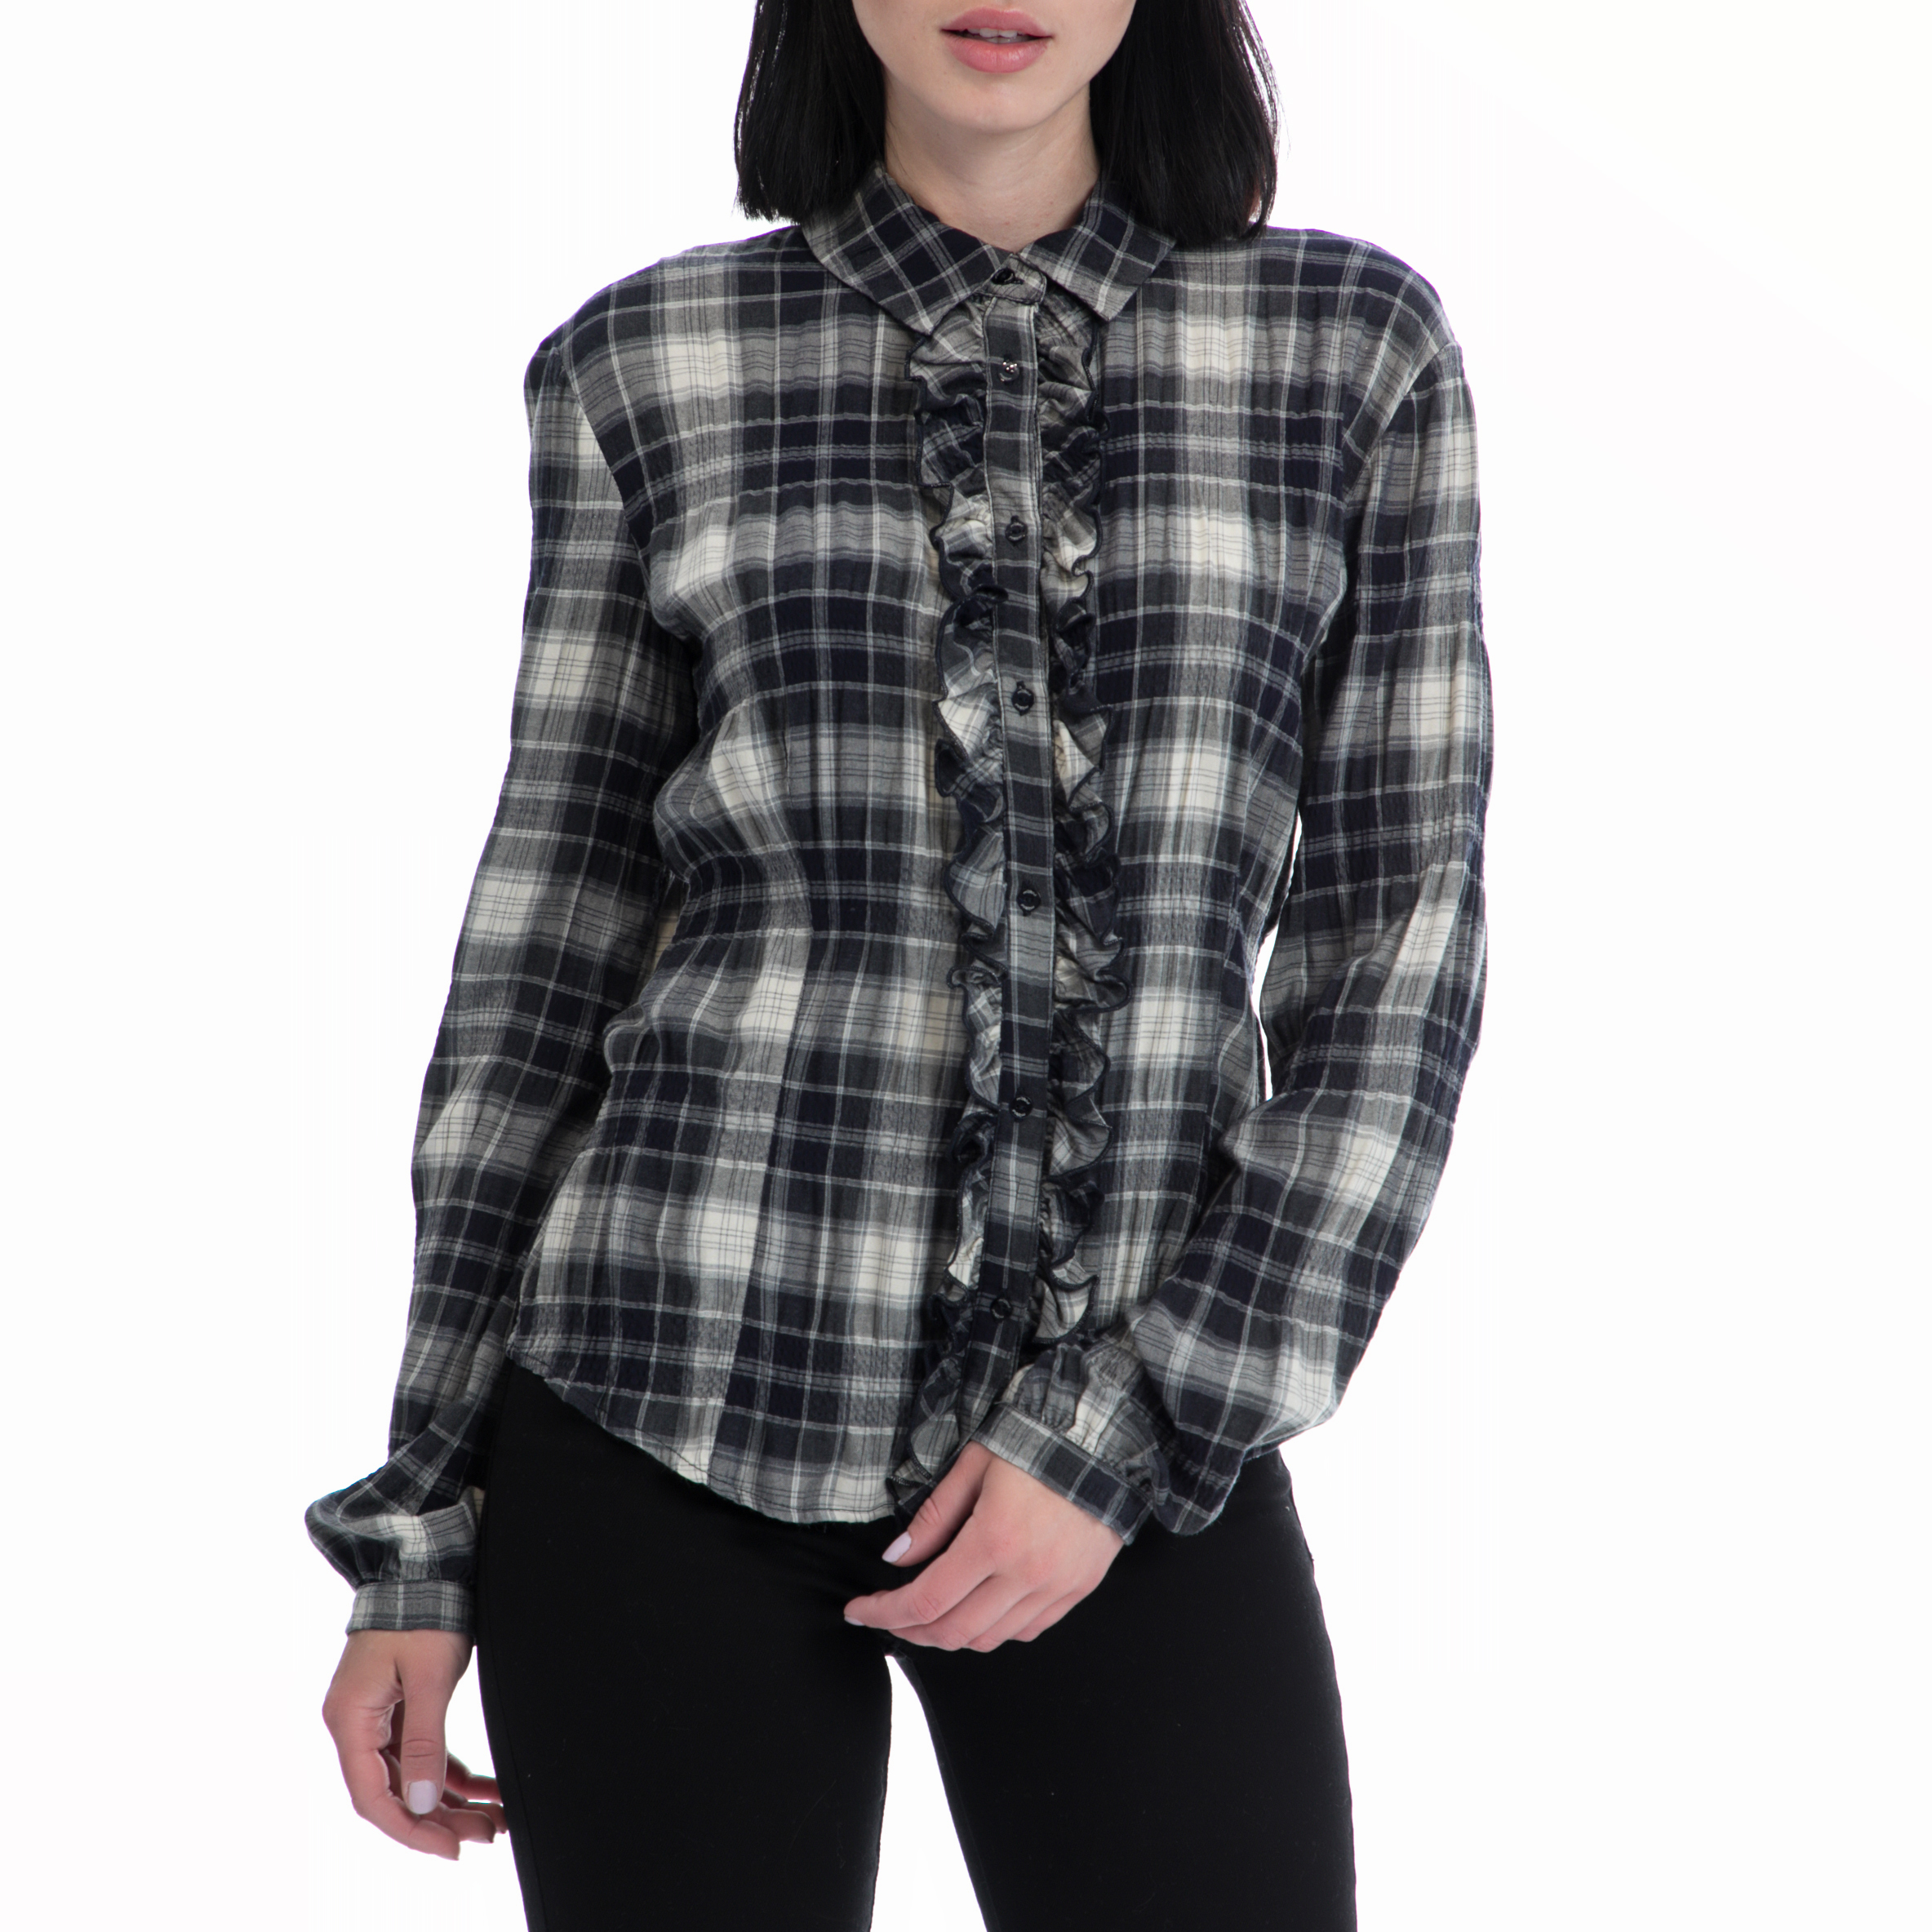 MOTIVI - Γυναικείο πουκάμισο MOTIVI γκρι-μαύρο γυναικεία ρούχα πουκάμισα μακρυμάνικα